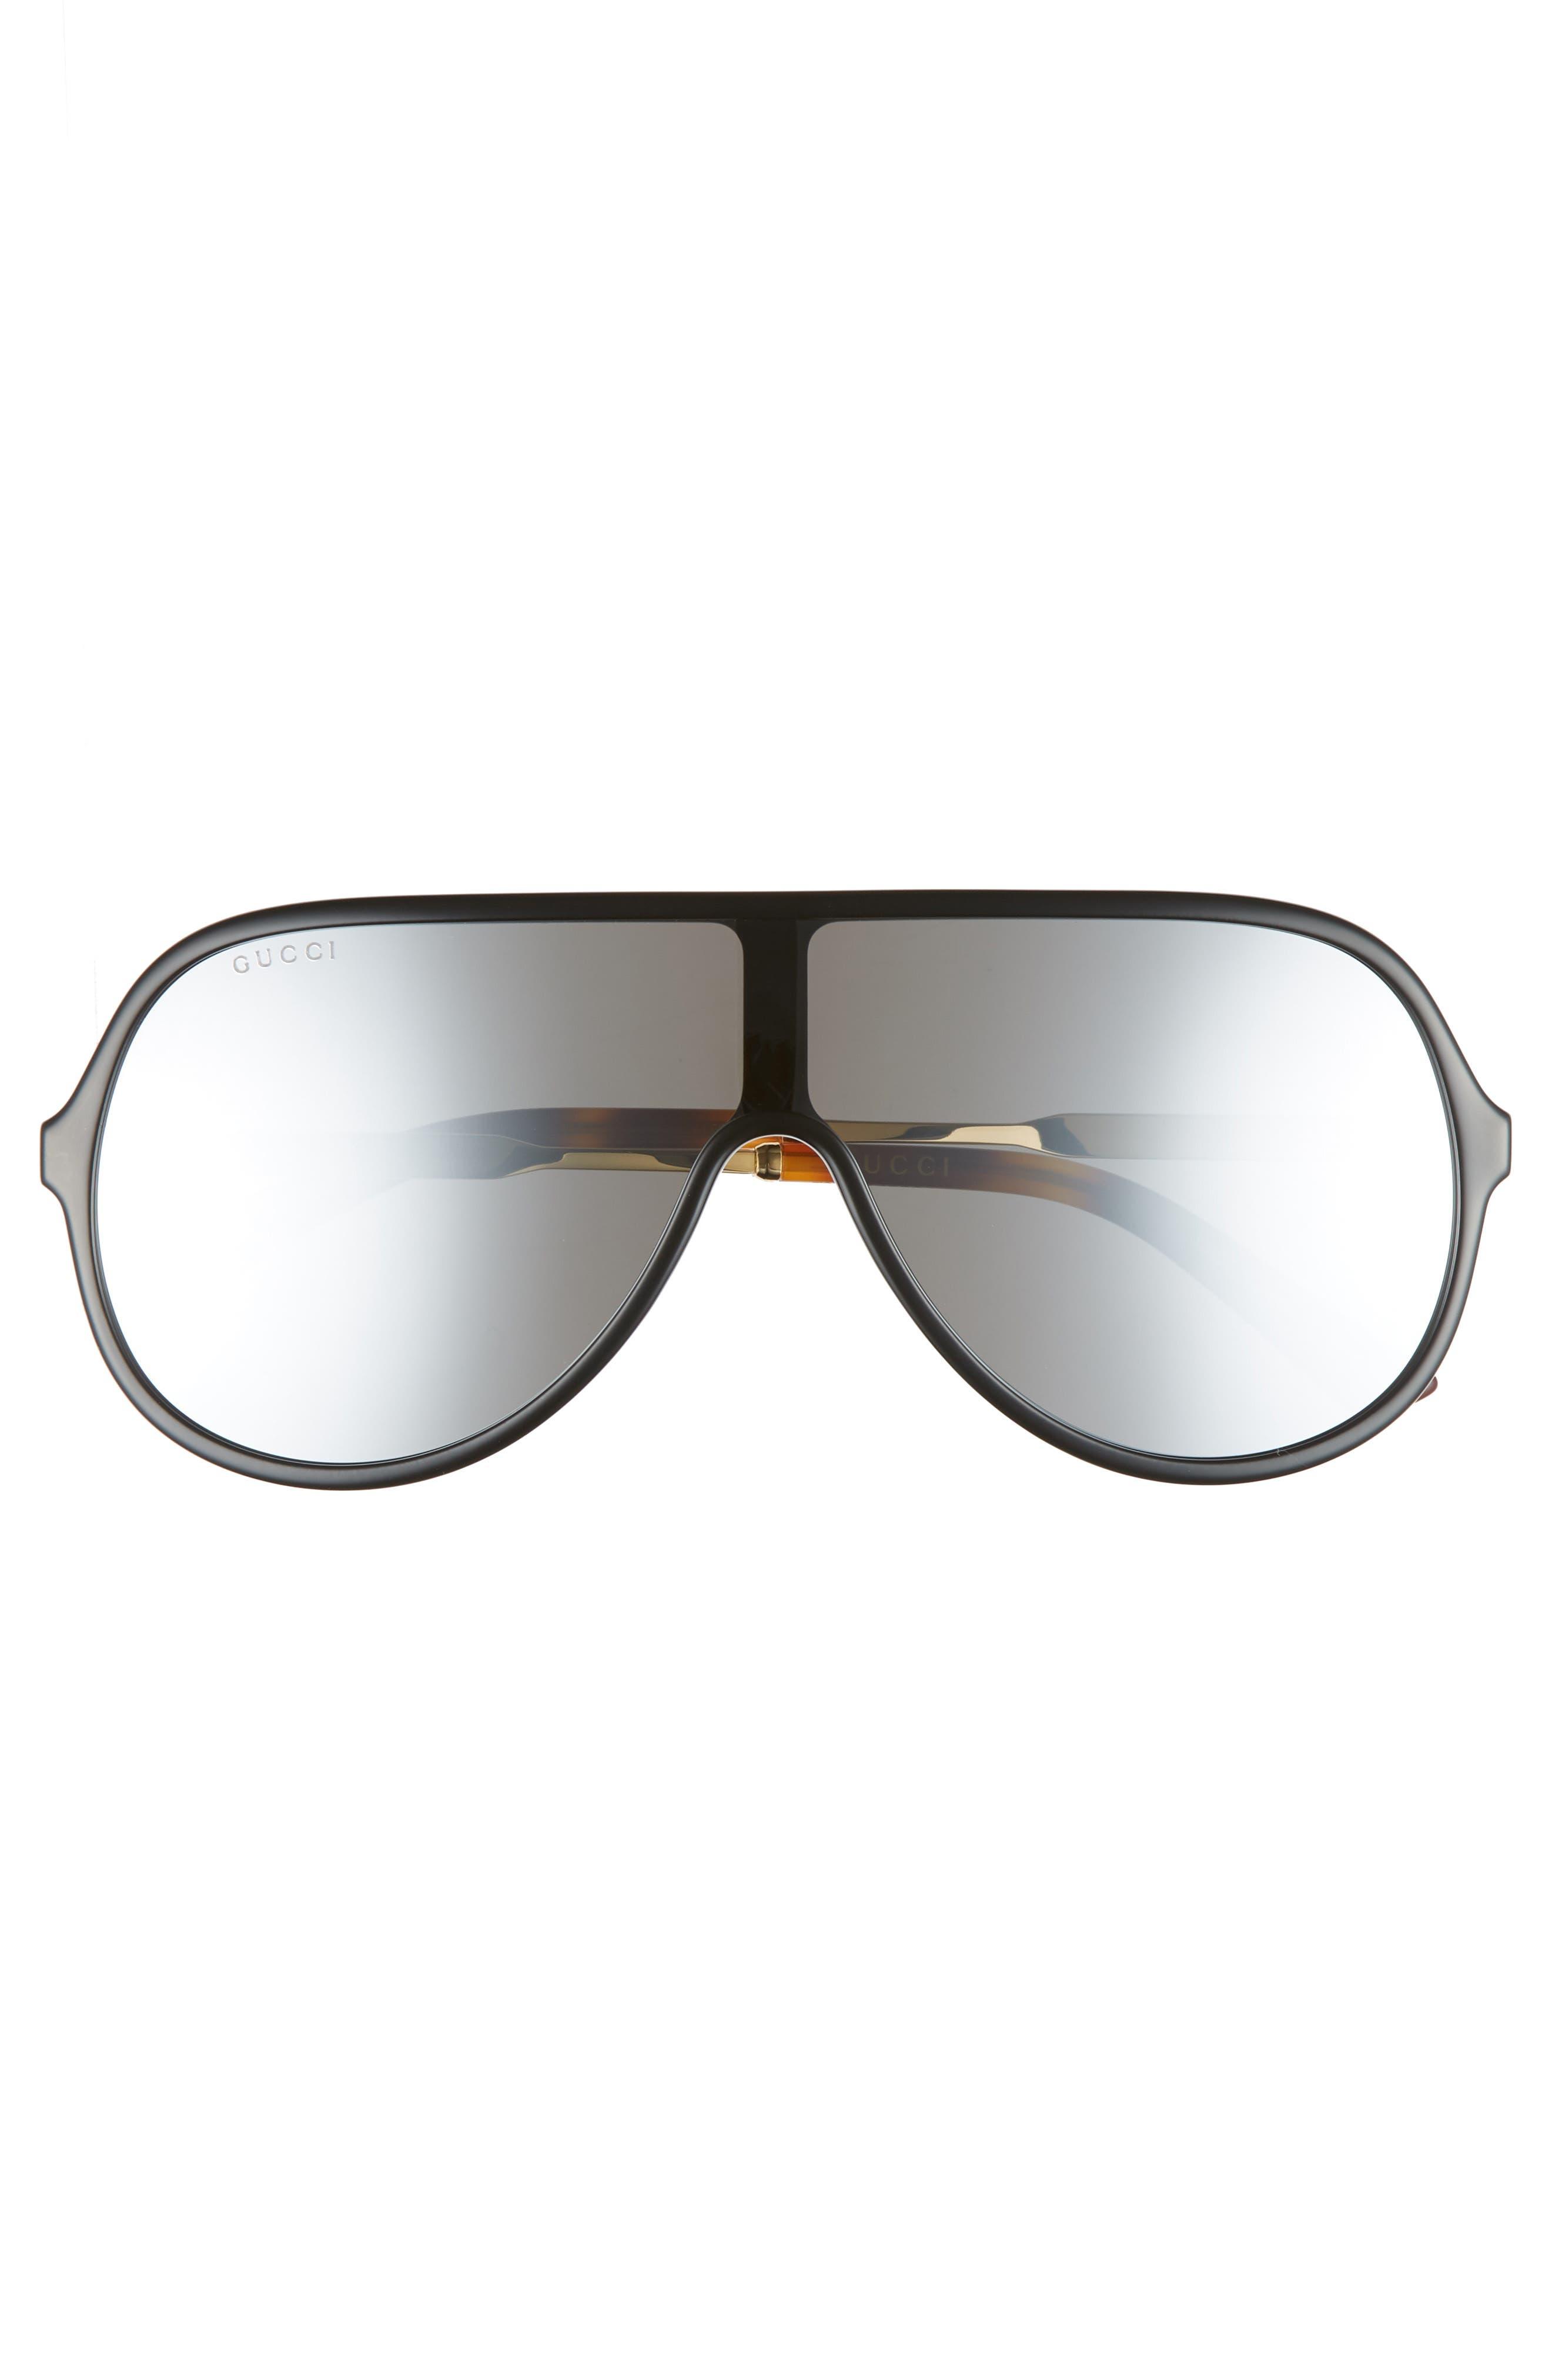 99mm Oversize Shield Sunglasses,                             Alternate thumbnail 2, color,                             Black